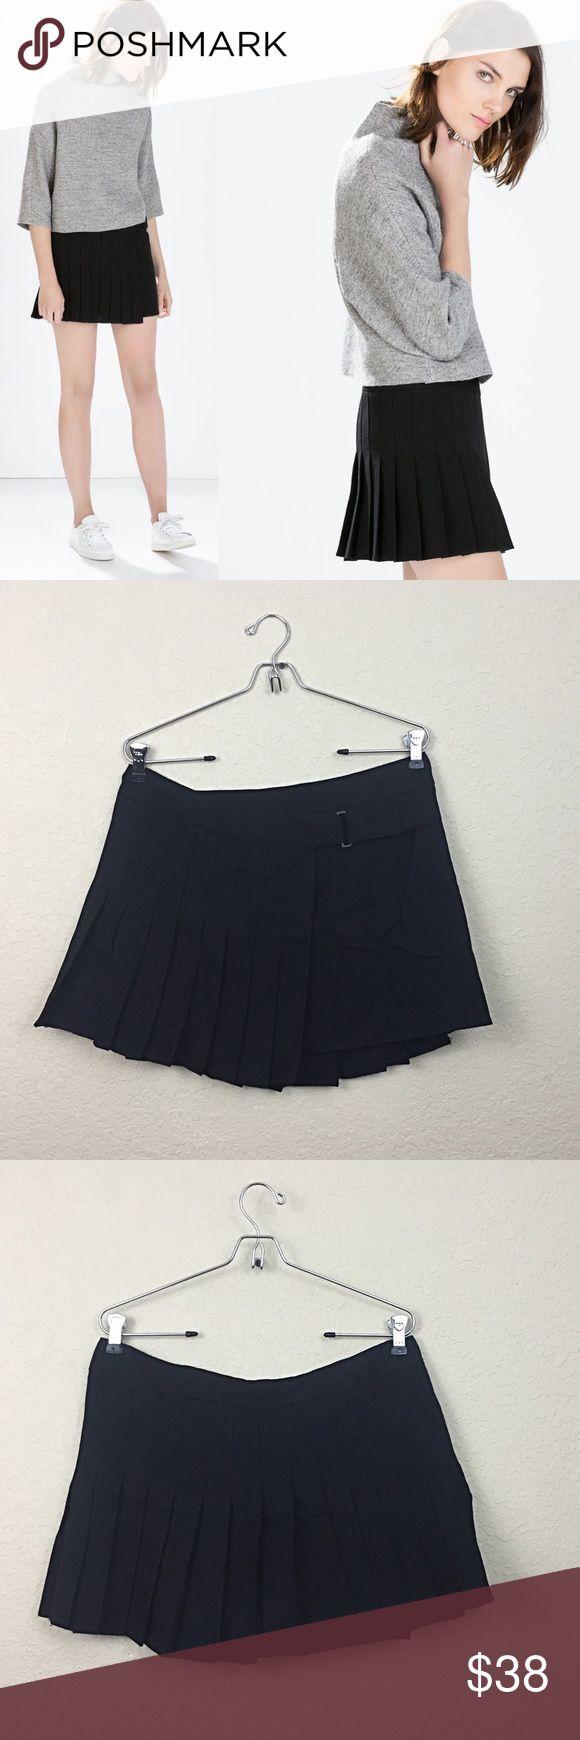 Zara skirt Zara pleated skirt new with tags size medium $99 Zara Skirts